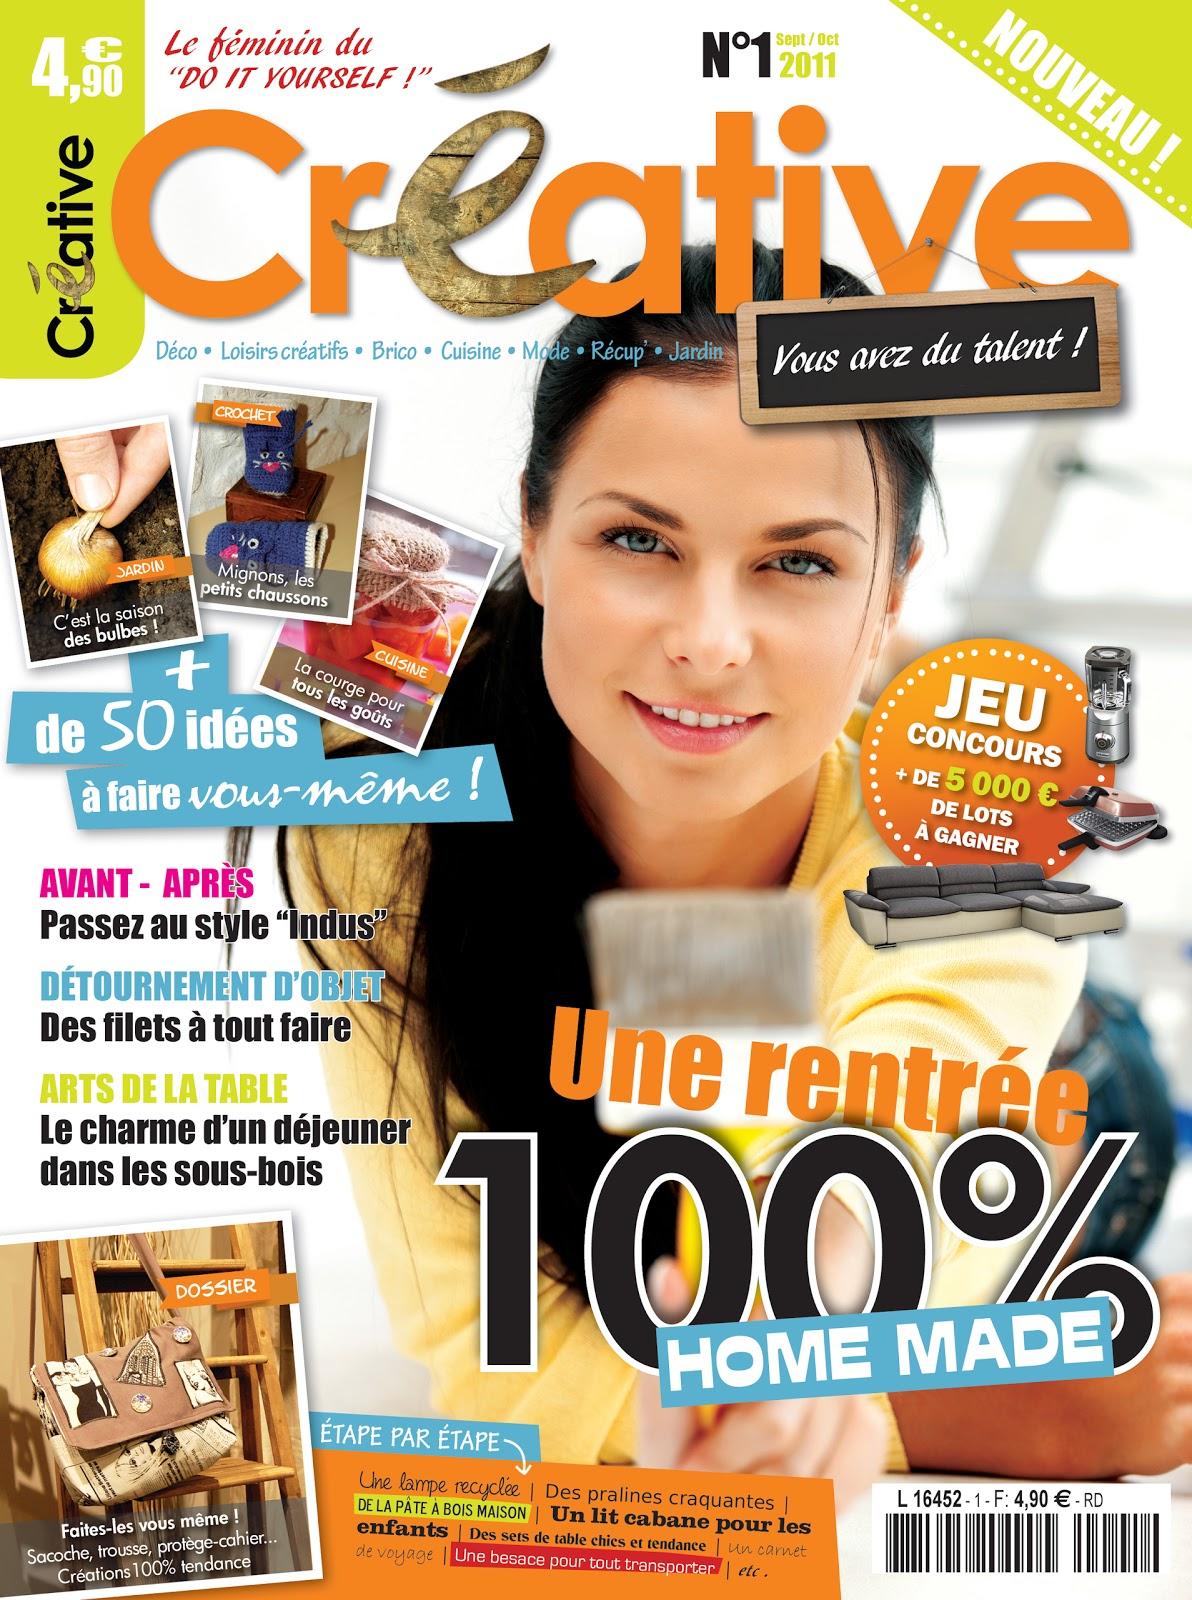 pik toile cr ative le magazine f minin du do it yourself. Black Bedroom Furniture Sets. Home Design Ideas